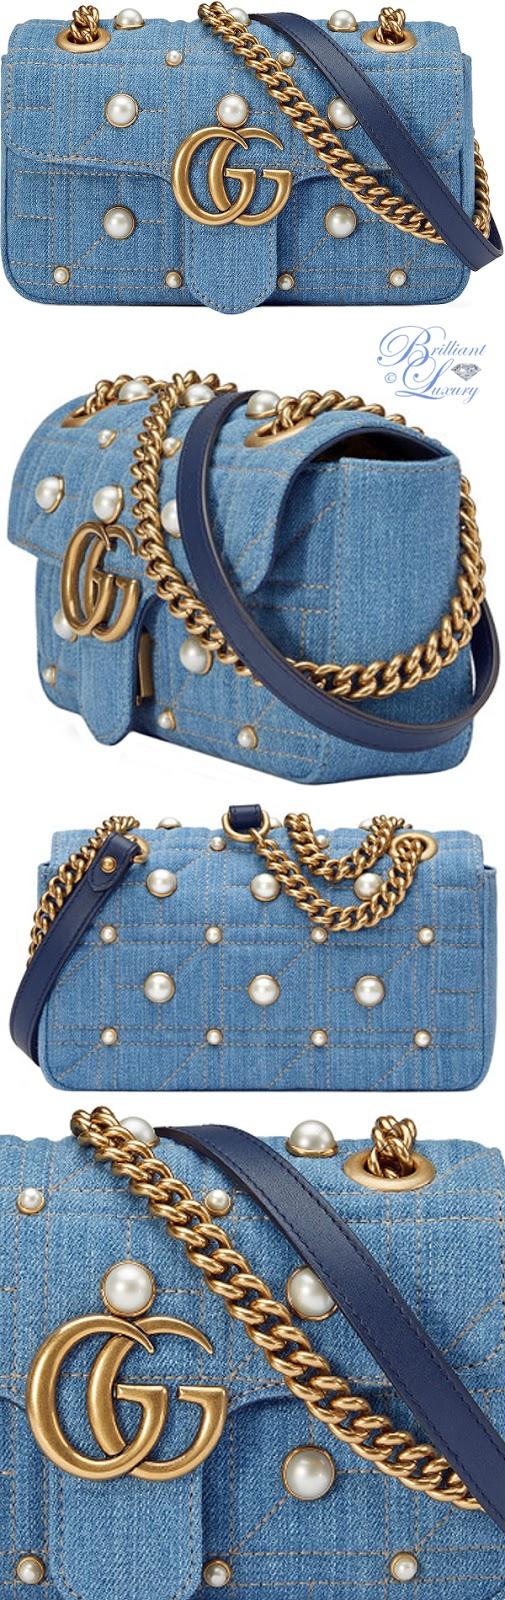 Brilliant Luxury ♦ Gucci GG Marmont denim shoulder bag